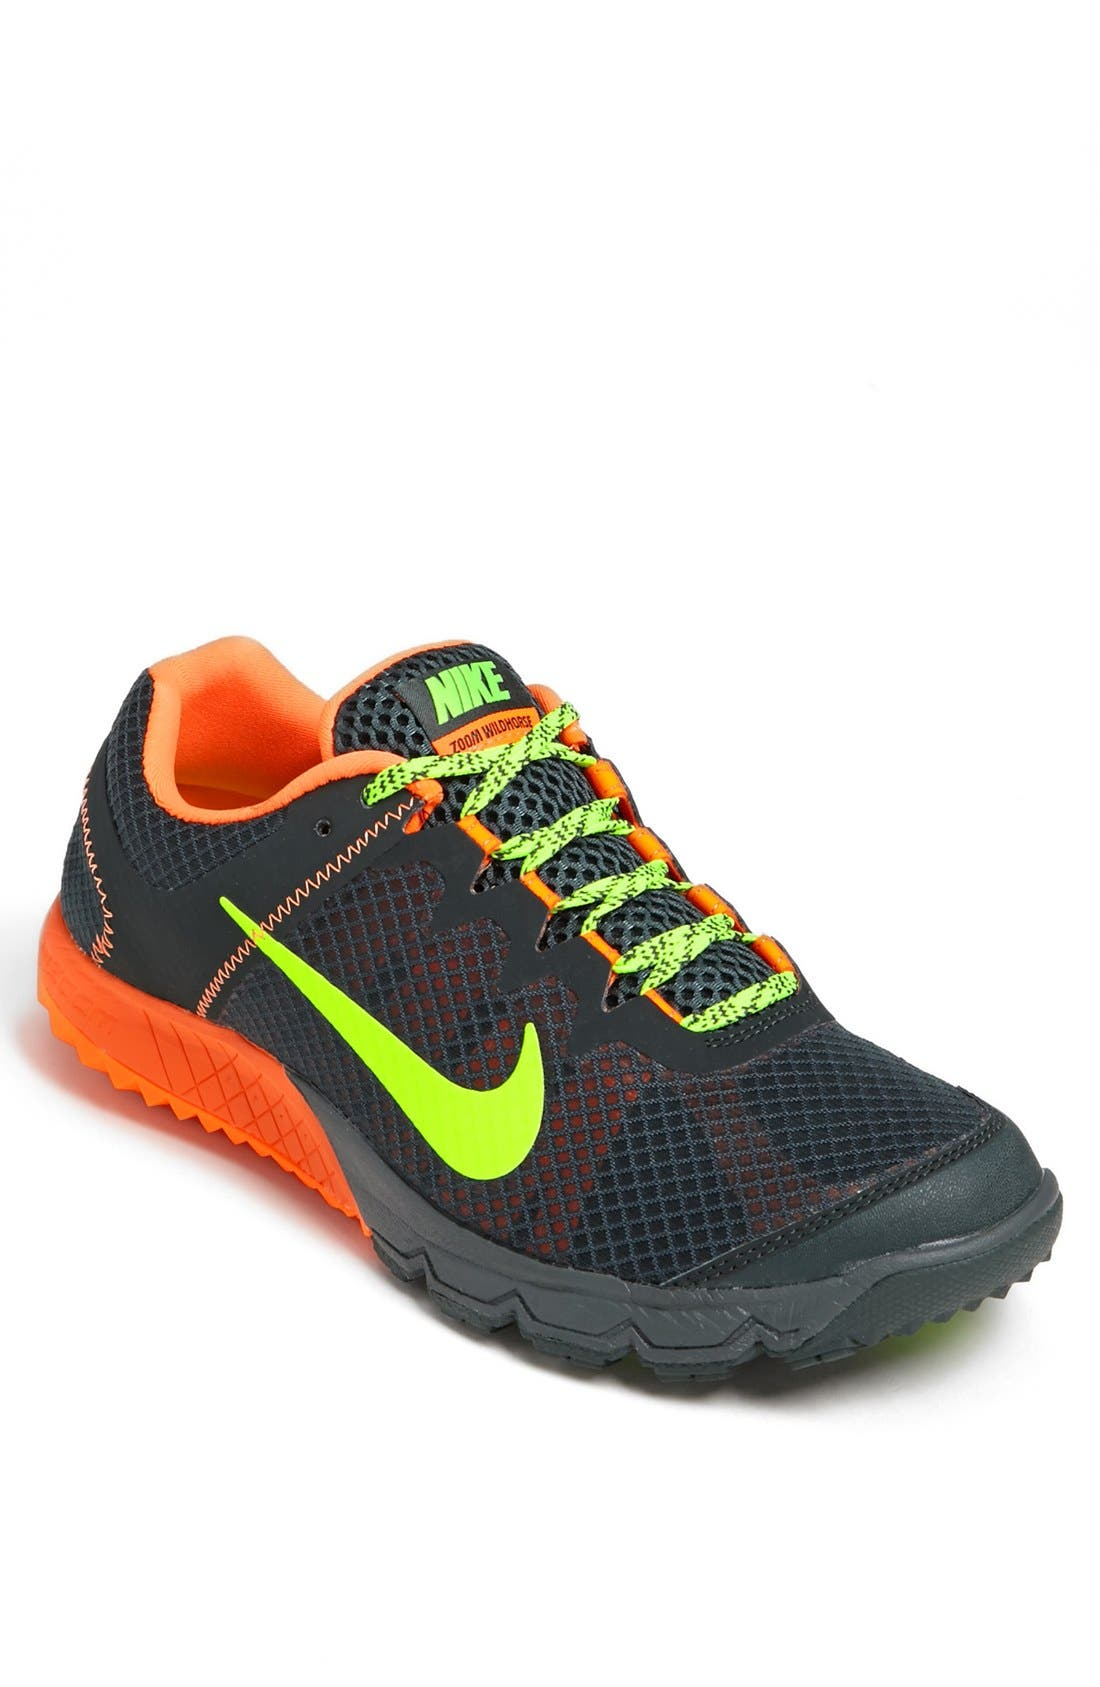 Alternate Image 1 Selected - Nike 'Zoom Wildhorse' Trail Running Shoe (Men)